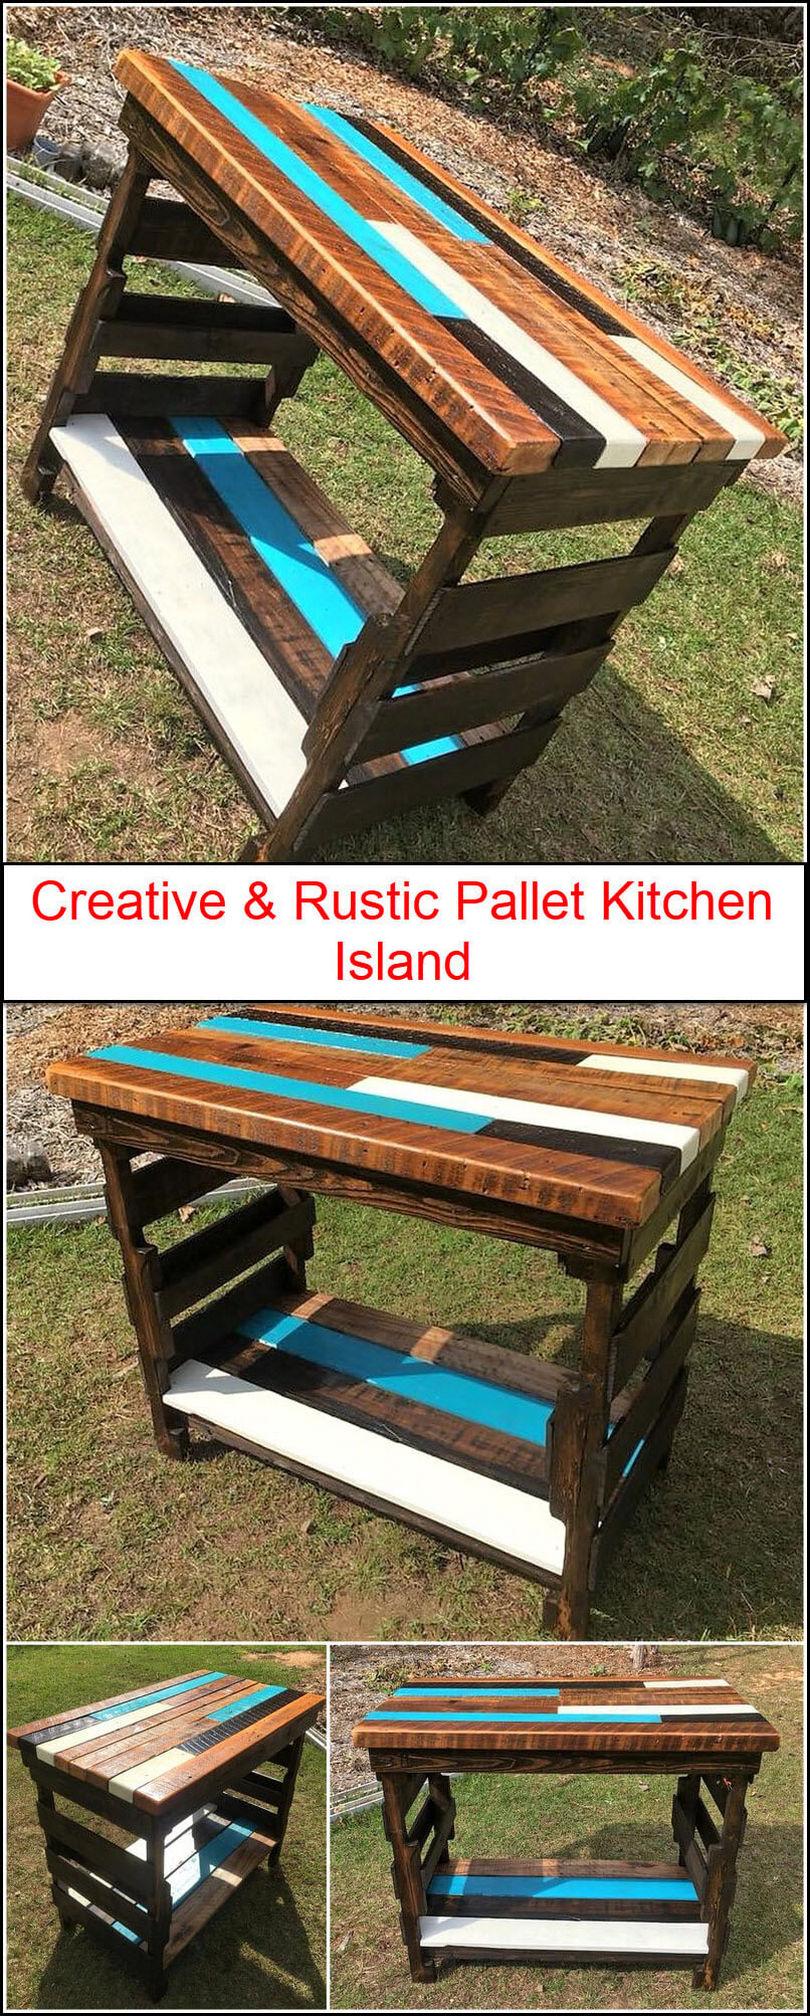 Rustic pallet creation 1